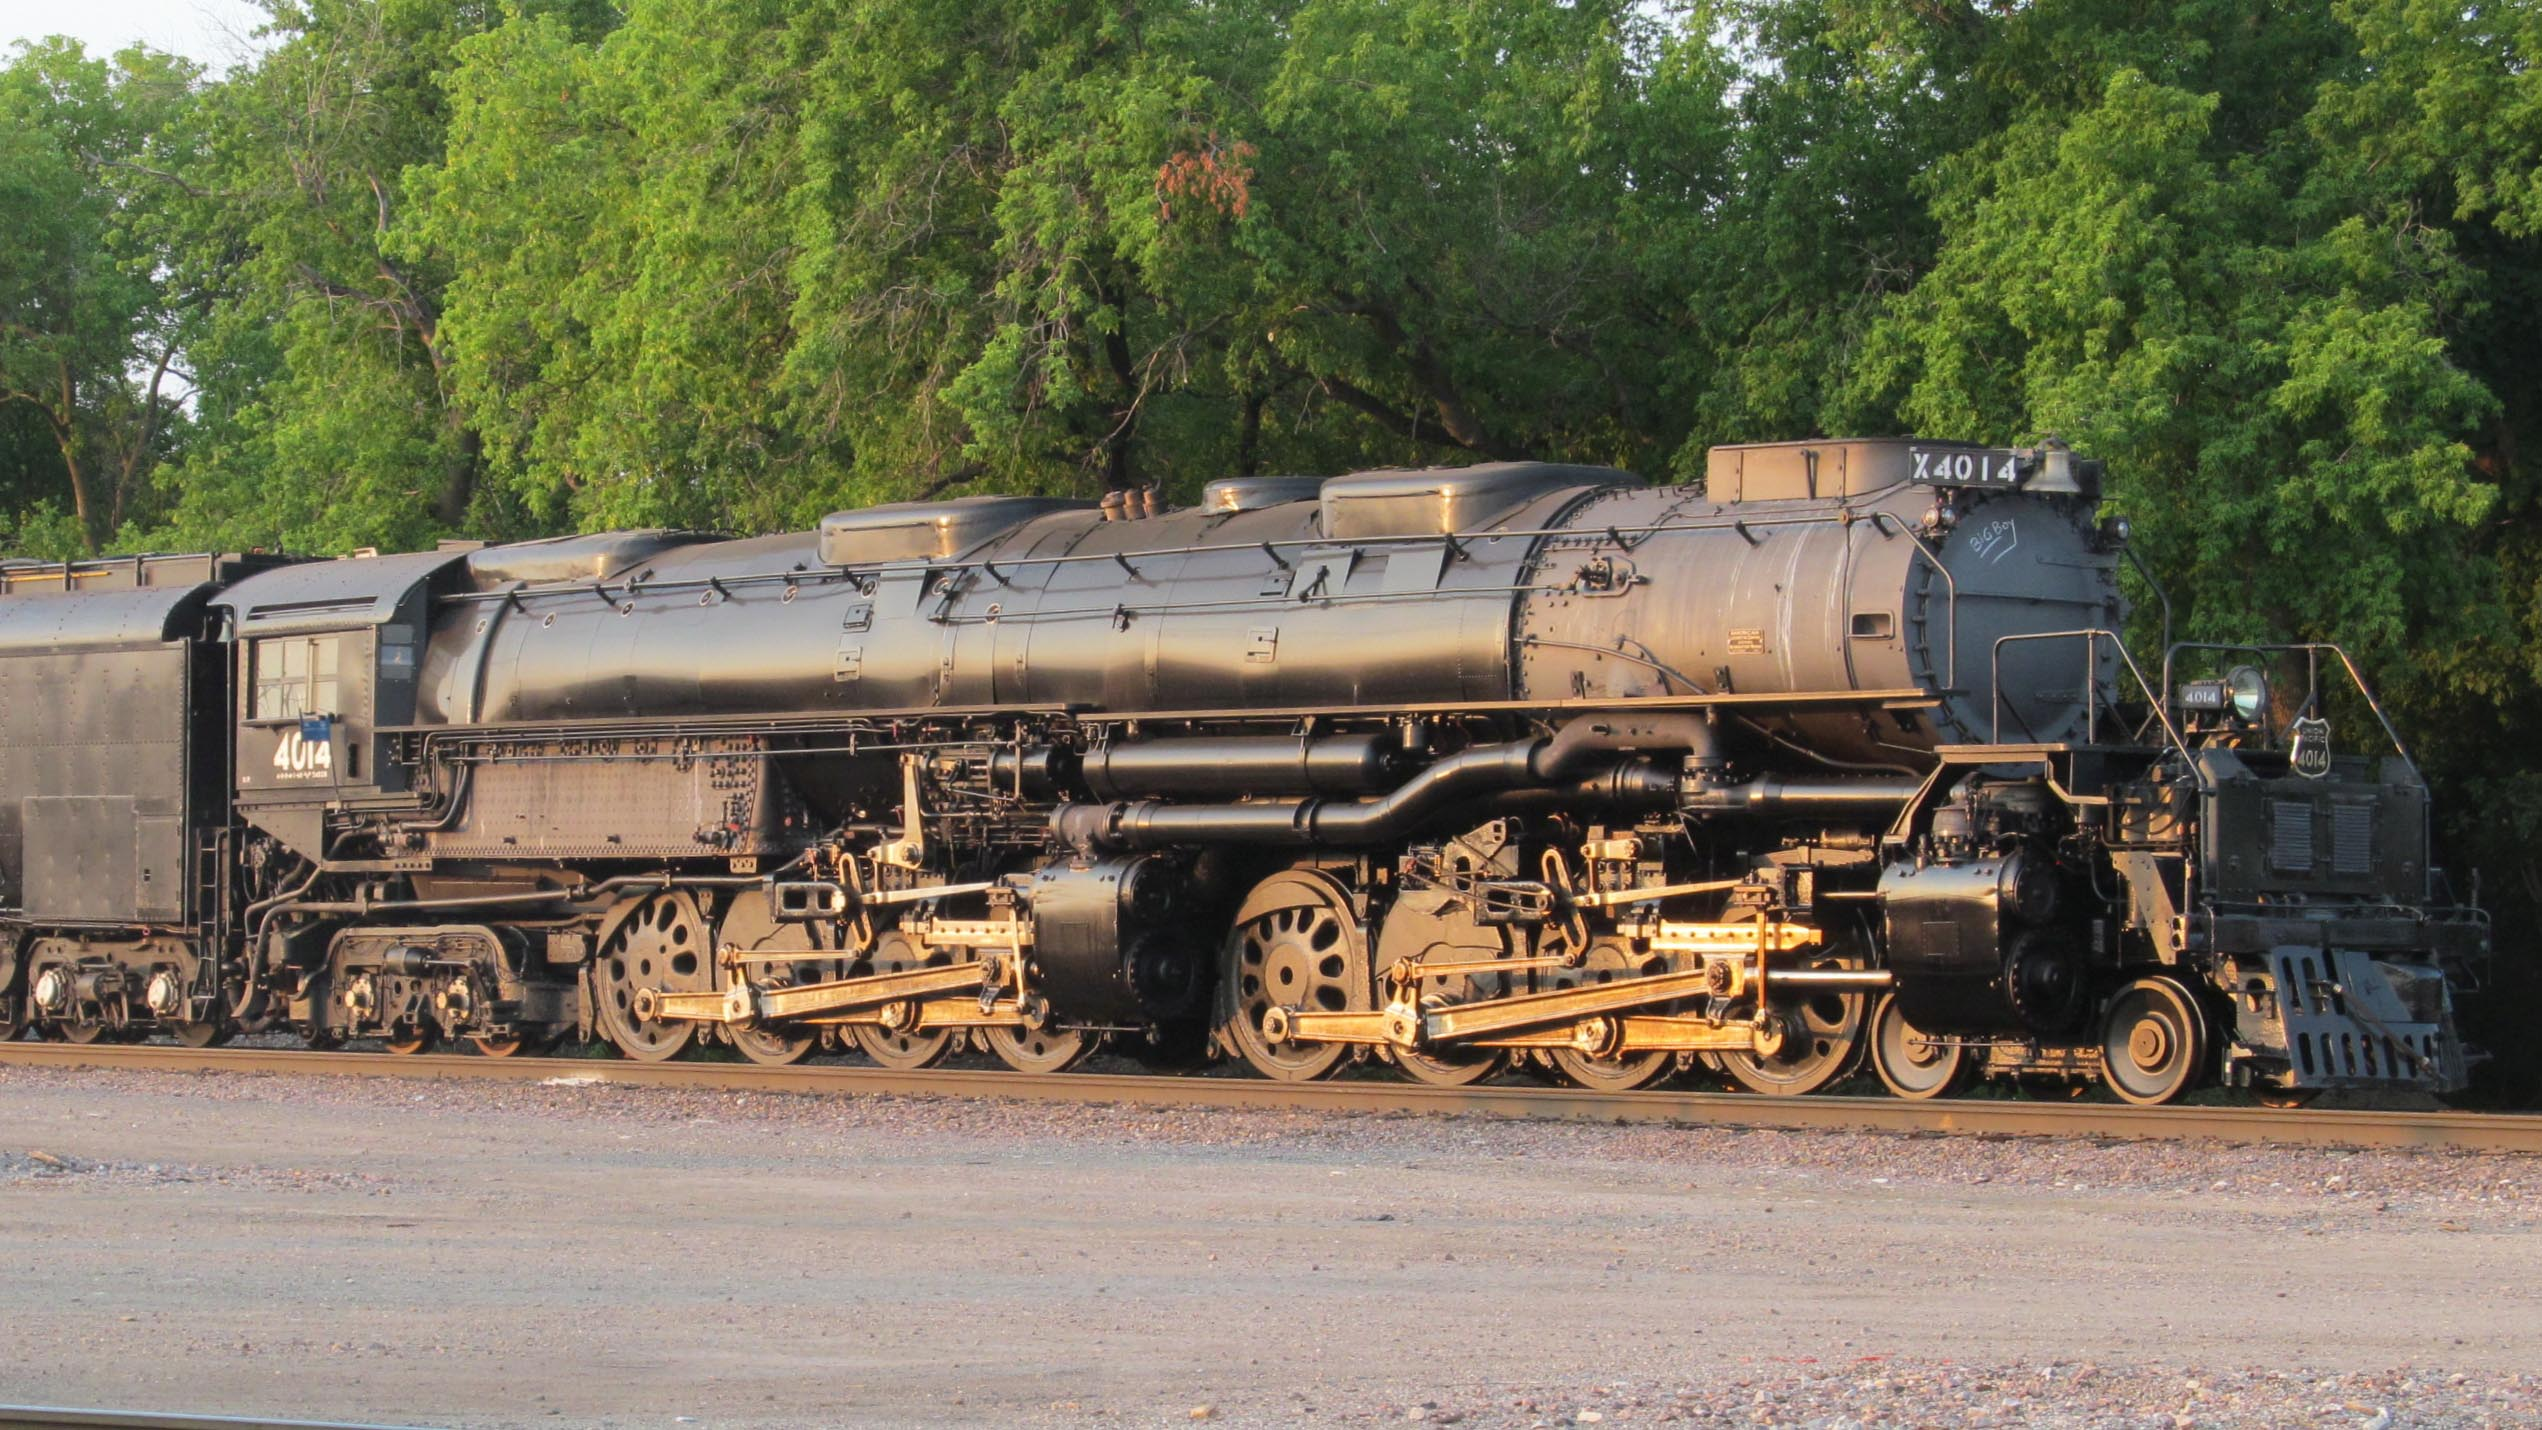 Union-Pacific-Big-Boy-4014-Mike-Rusnak